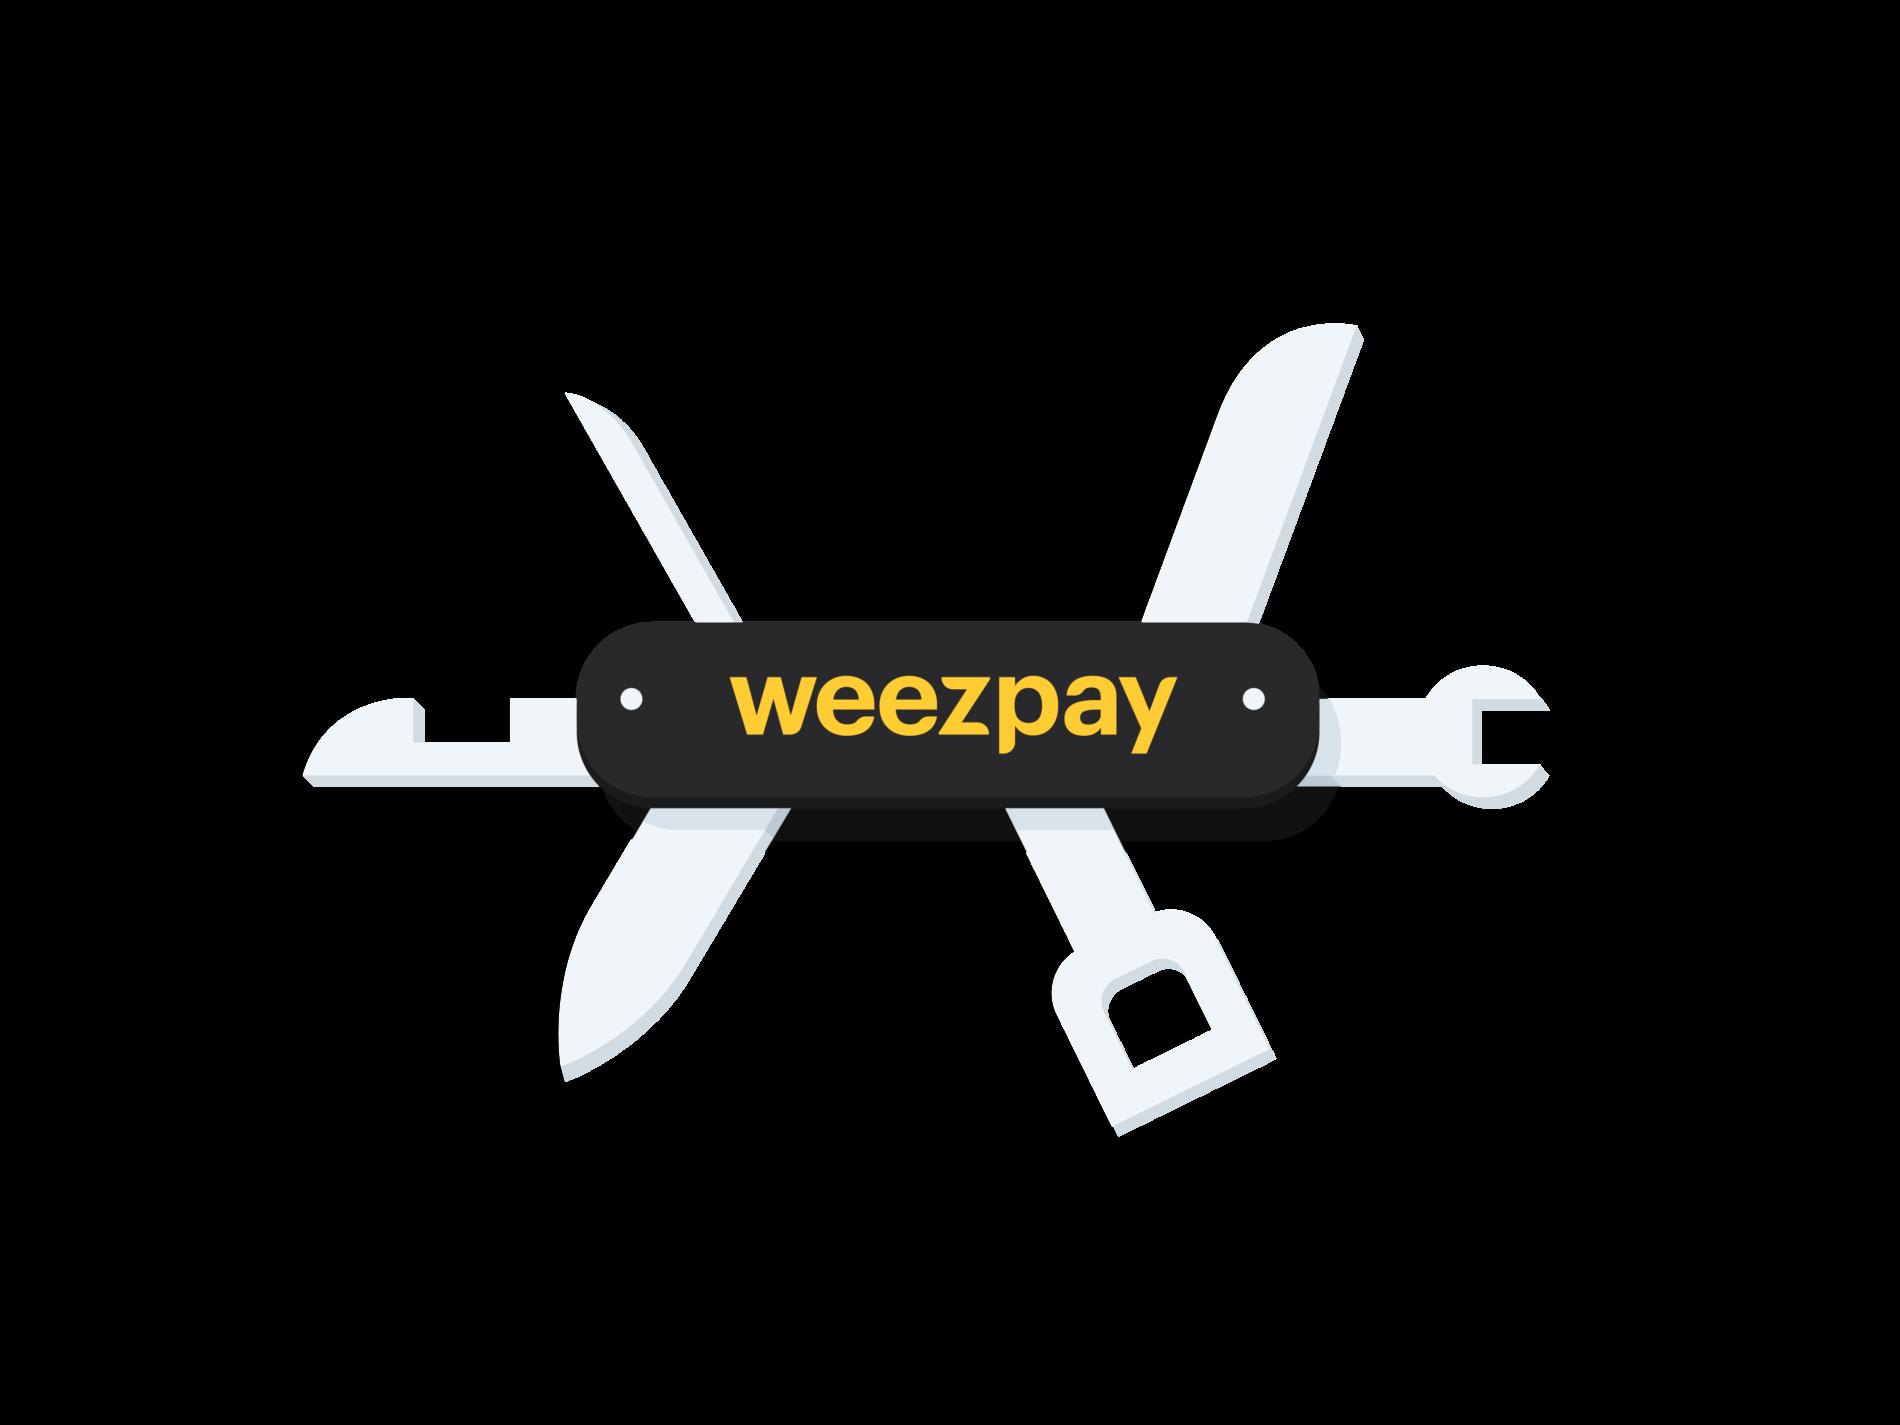 weezevent-wf-illu-couteau-4000x3000